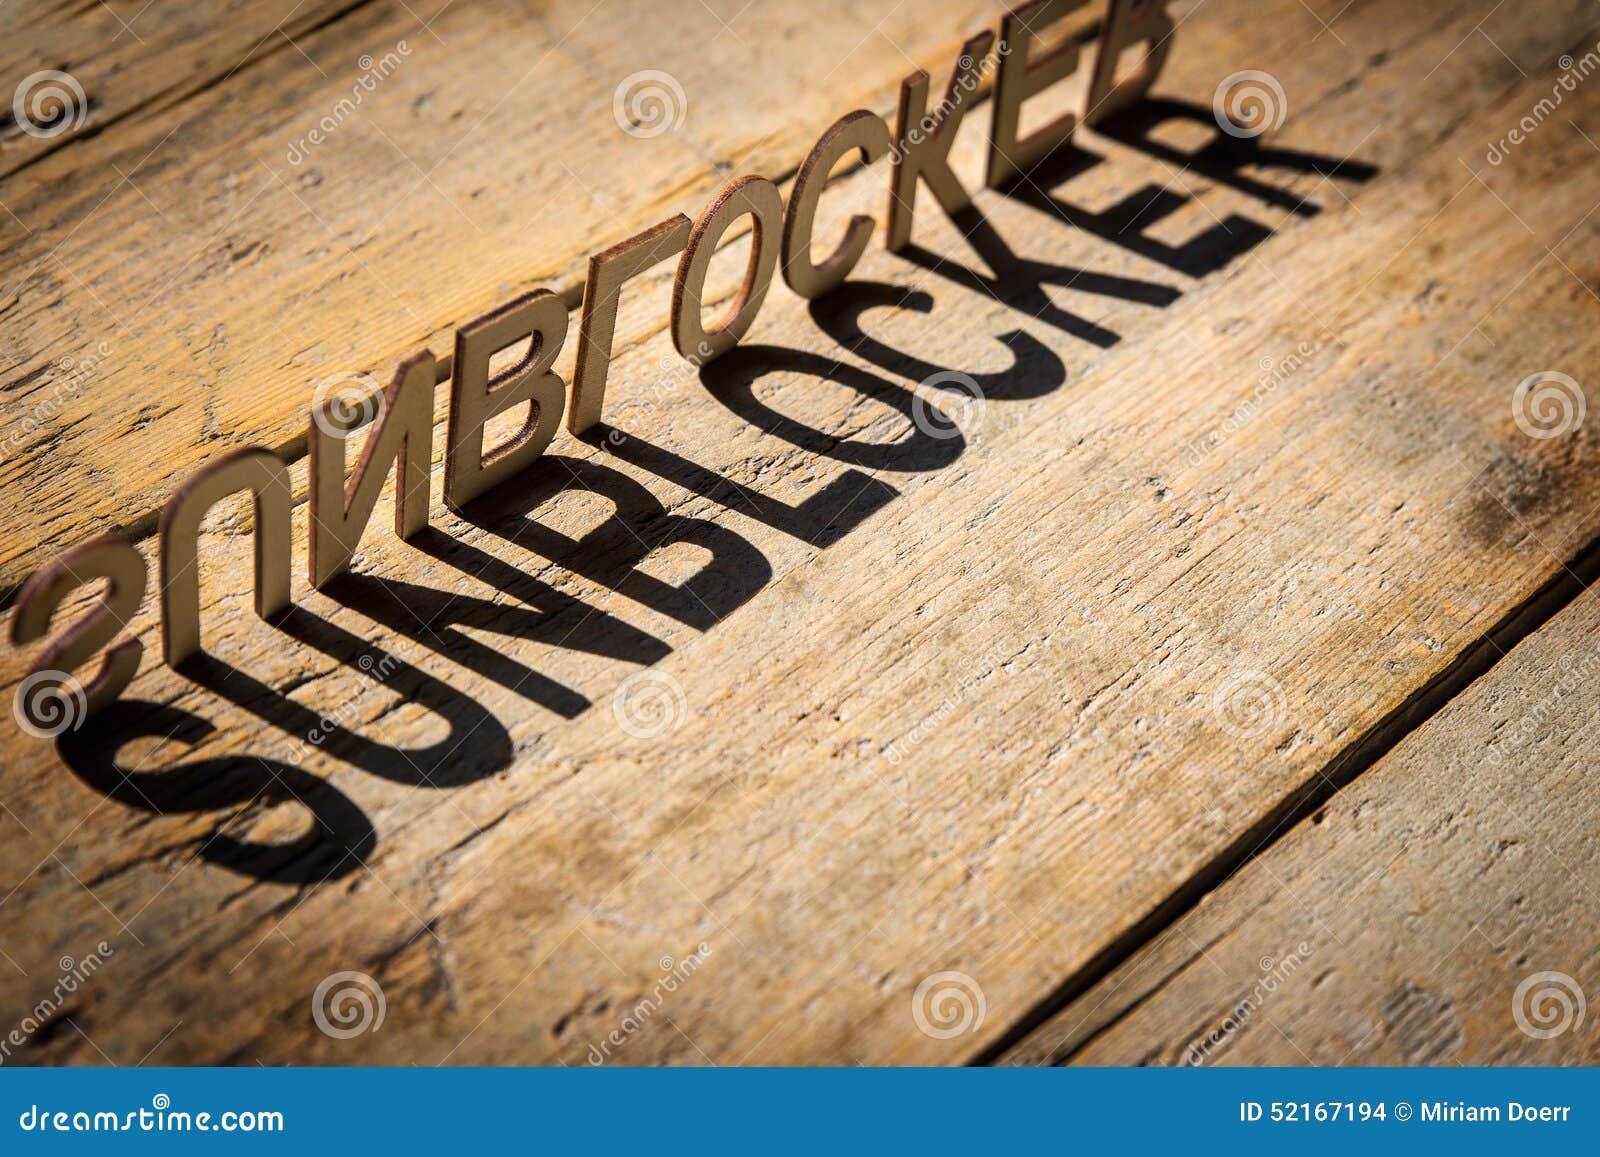 wooden letters build the word sunblocker stock photo image 52167194. Black Bedroom Furniture Sets. Home Design Ideas